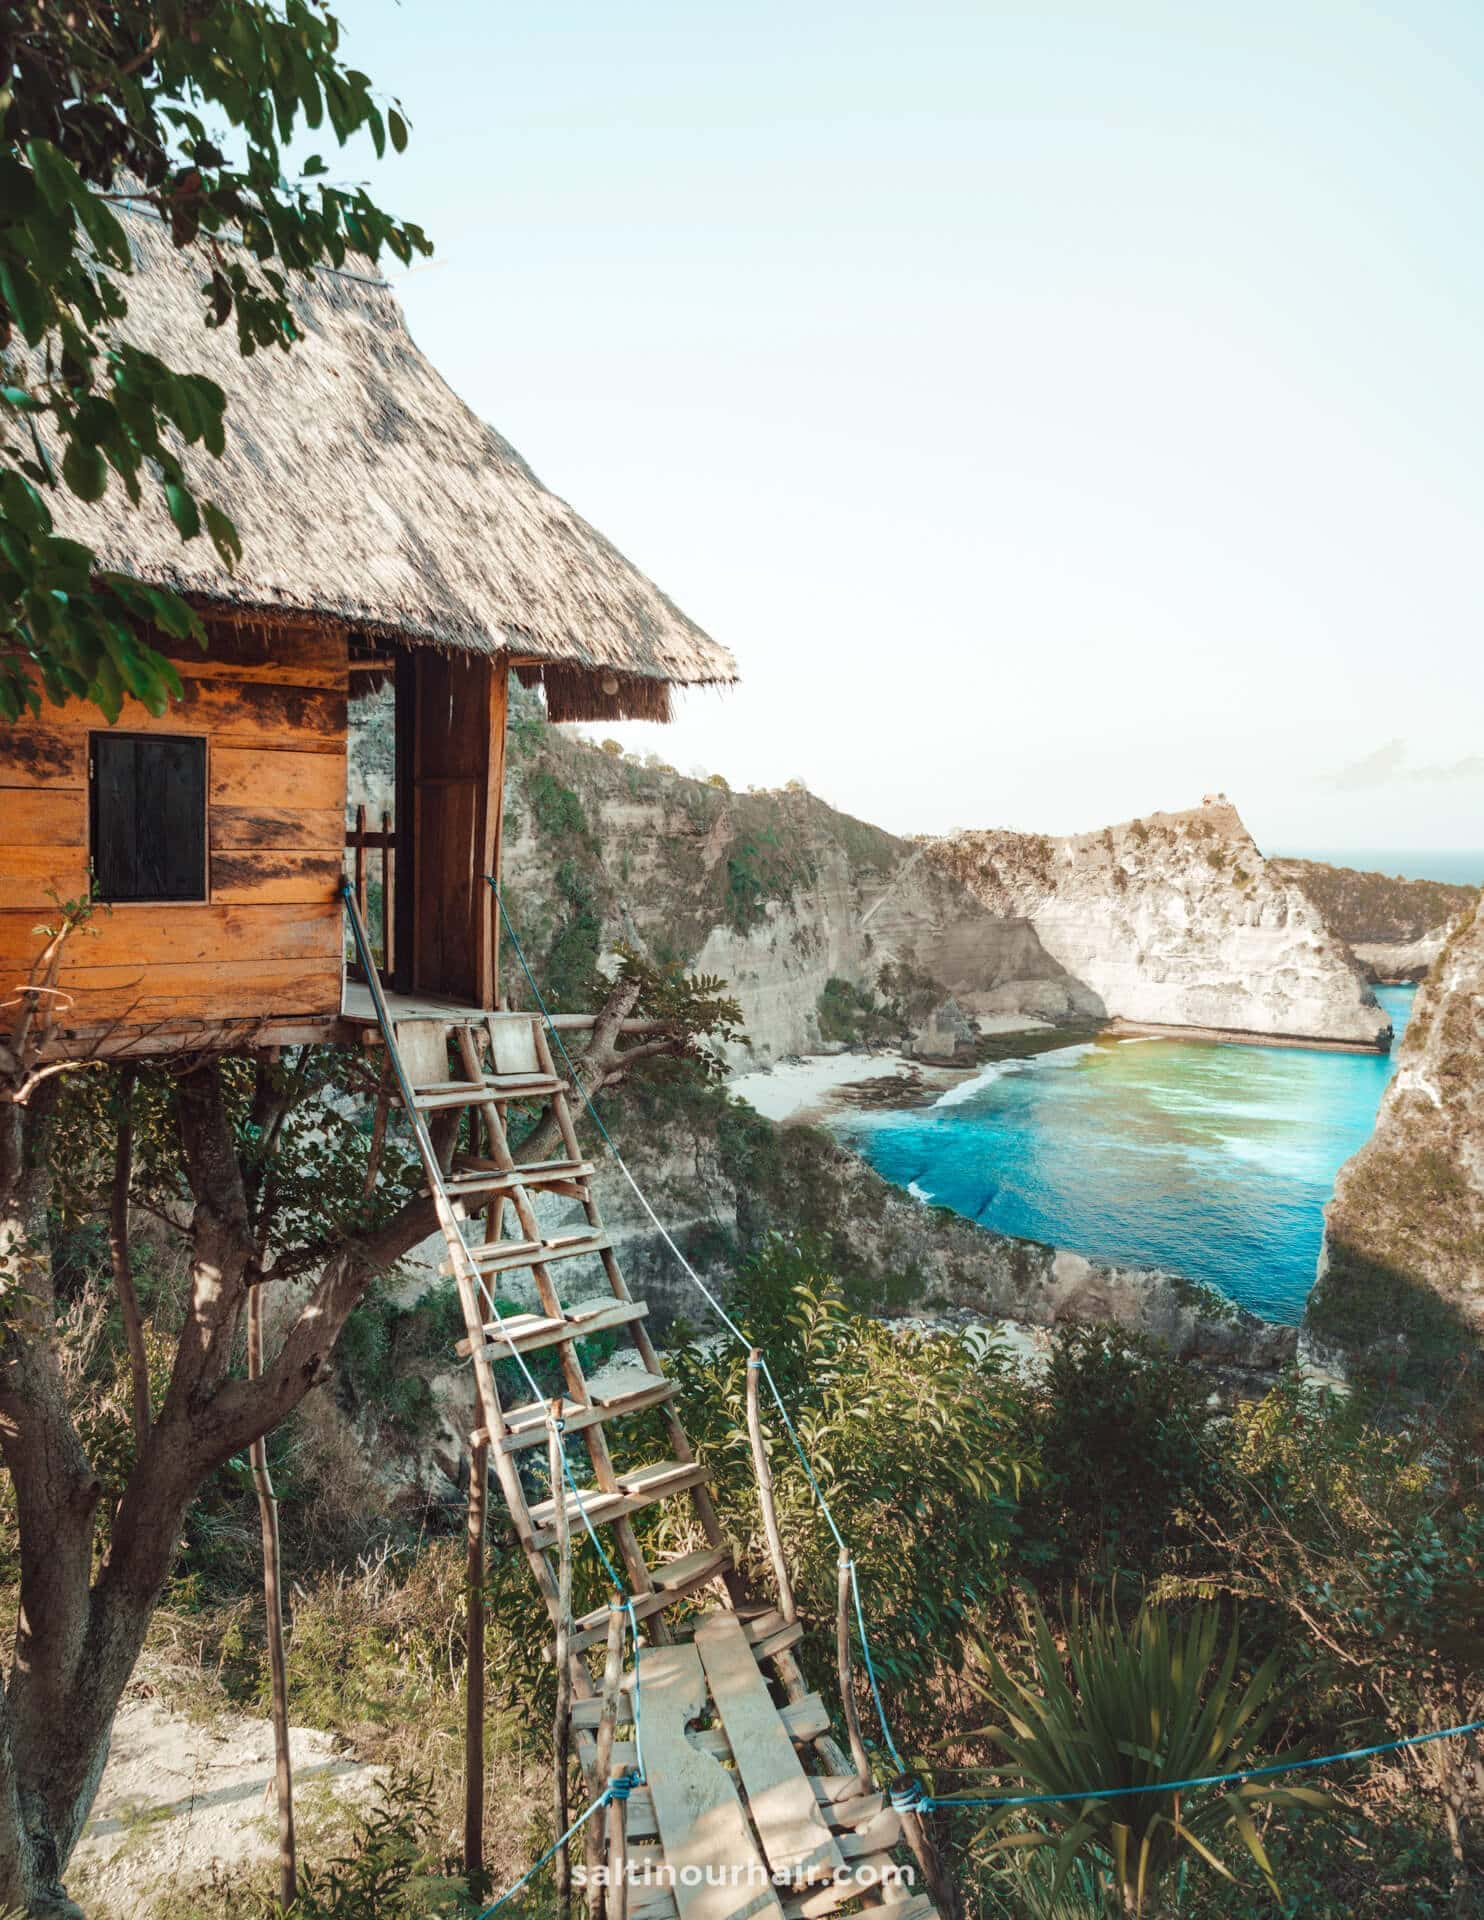 nusa penida trip guide treehouse